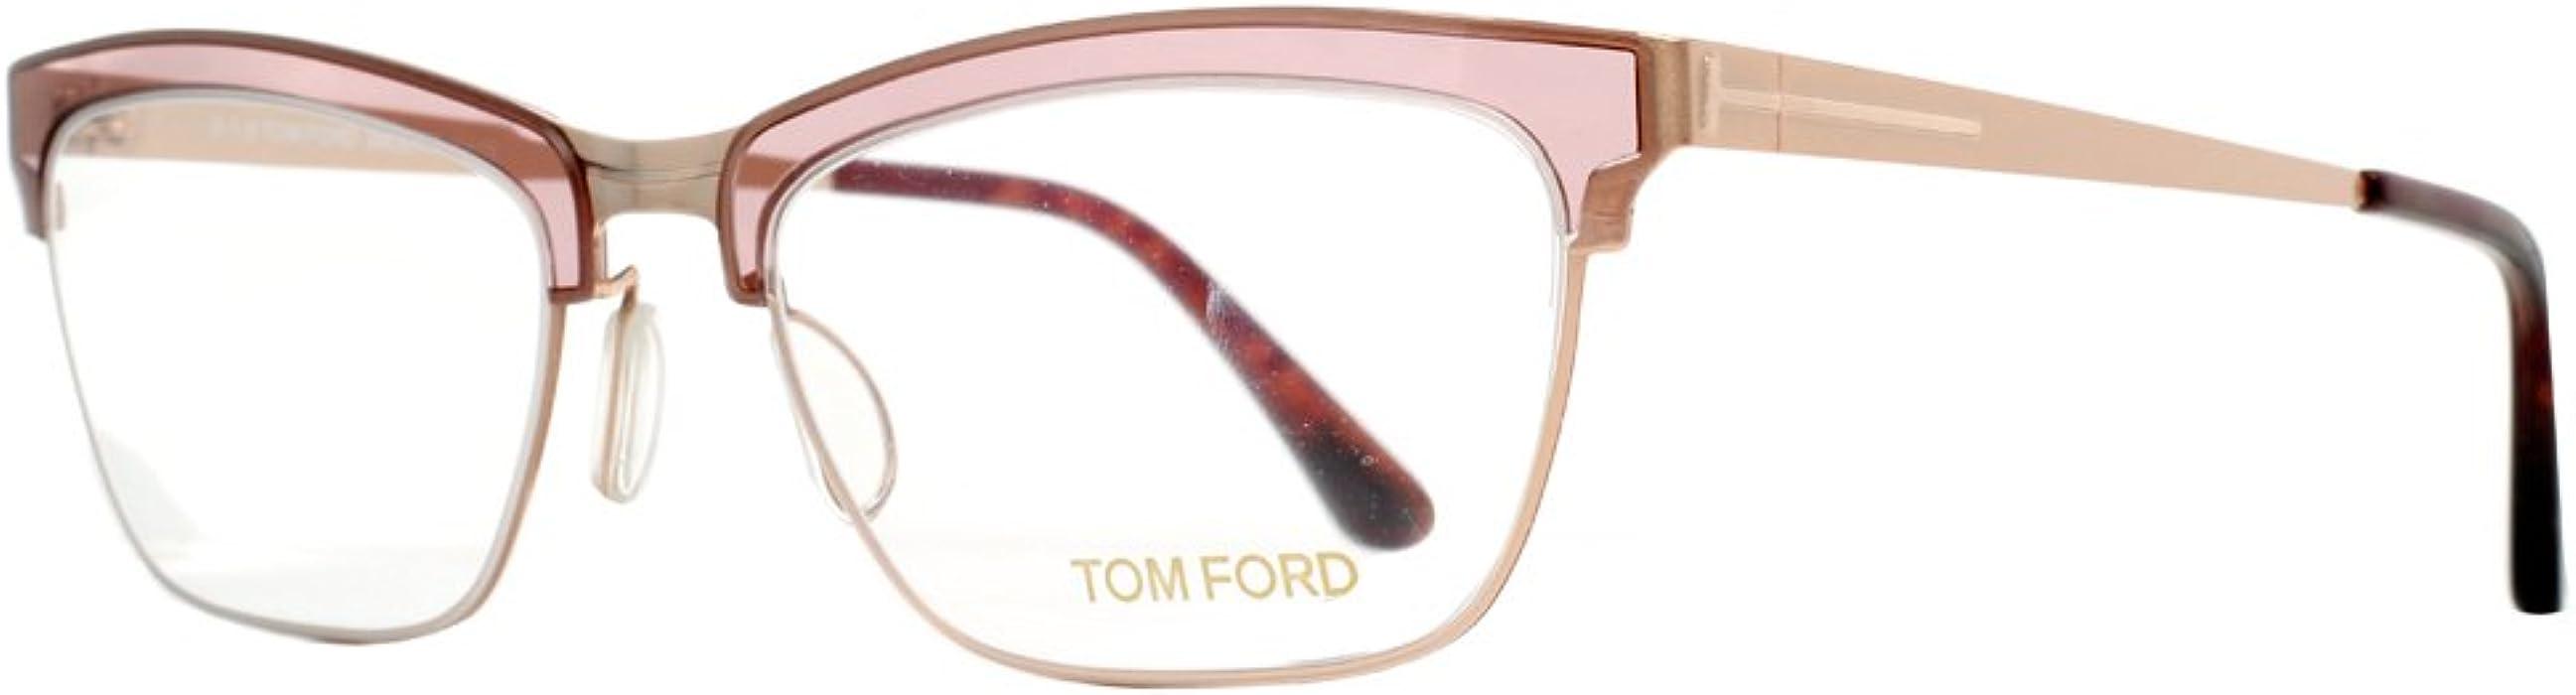 c76062a39b TOM FORD Women FT 5392 050 AI MATTE GOLD BEIGE 54mm at Amazon Men s ...